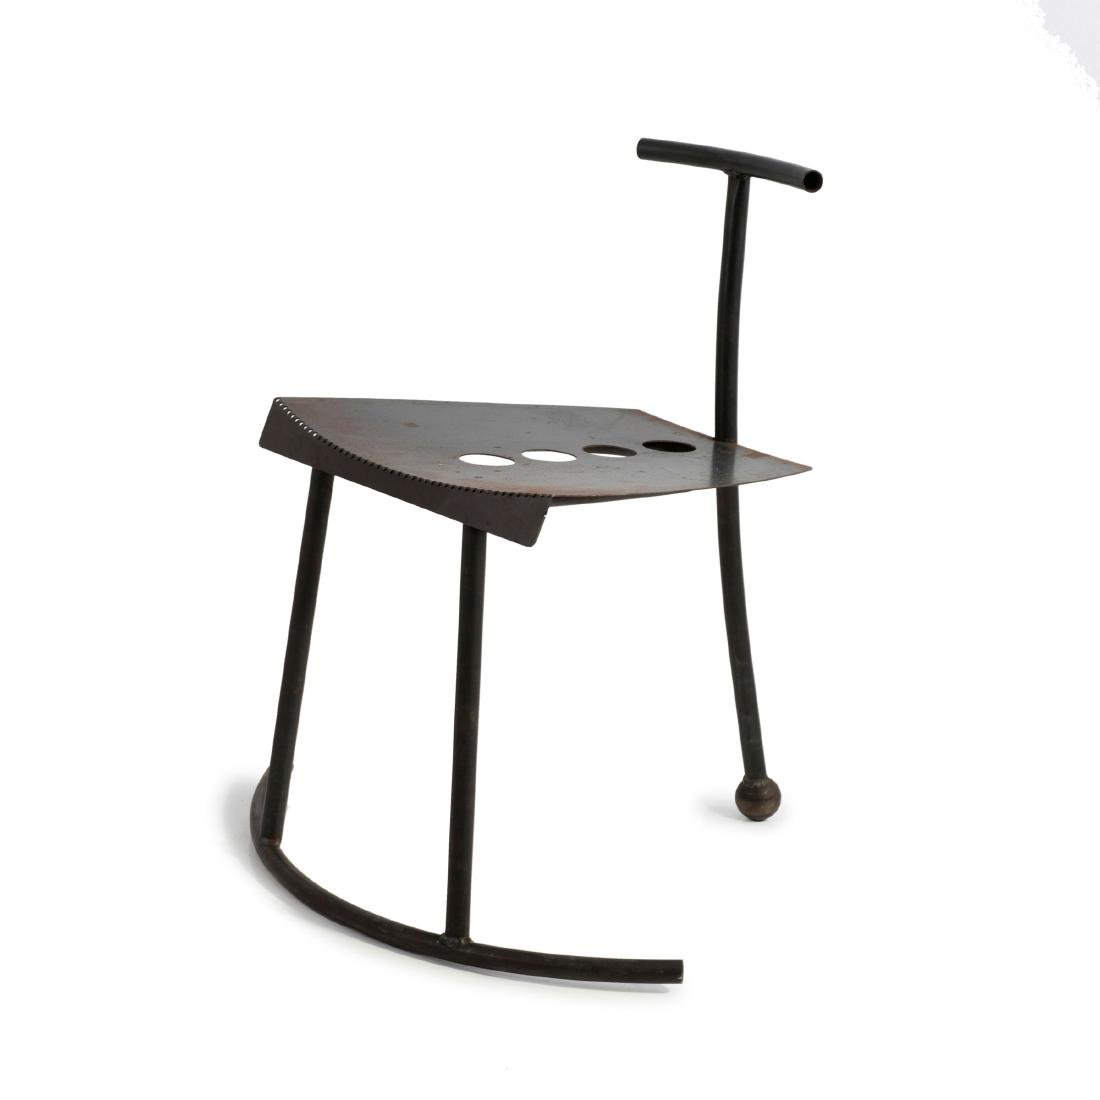 Rocking chair, c. 1999